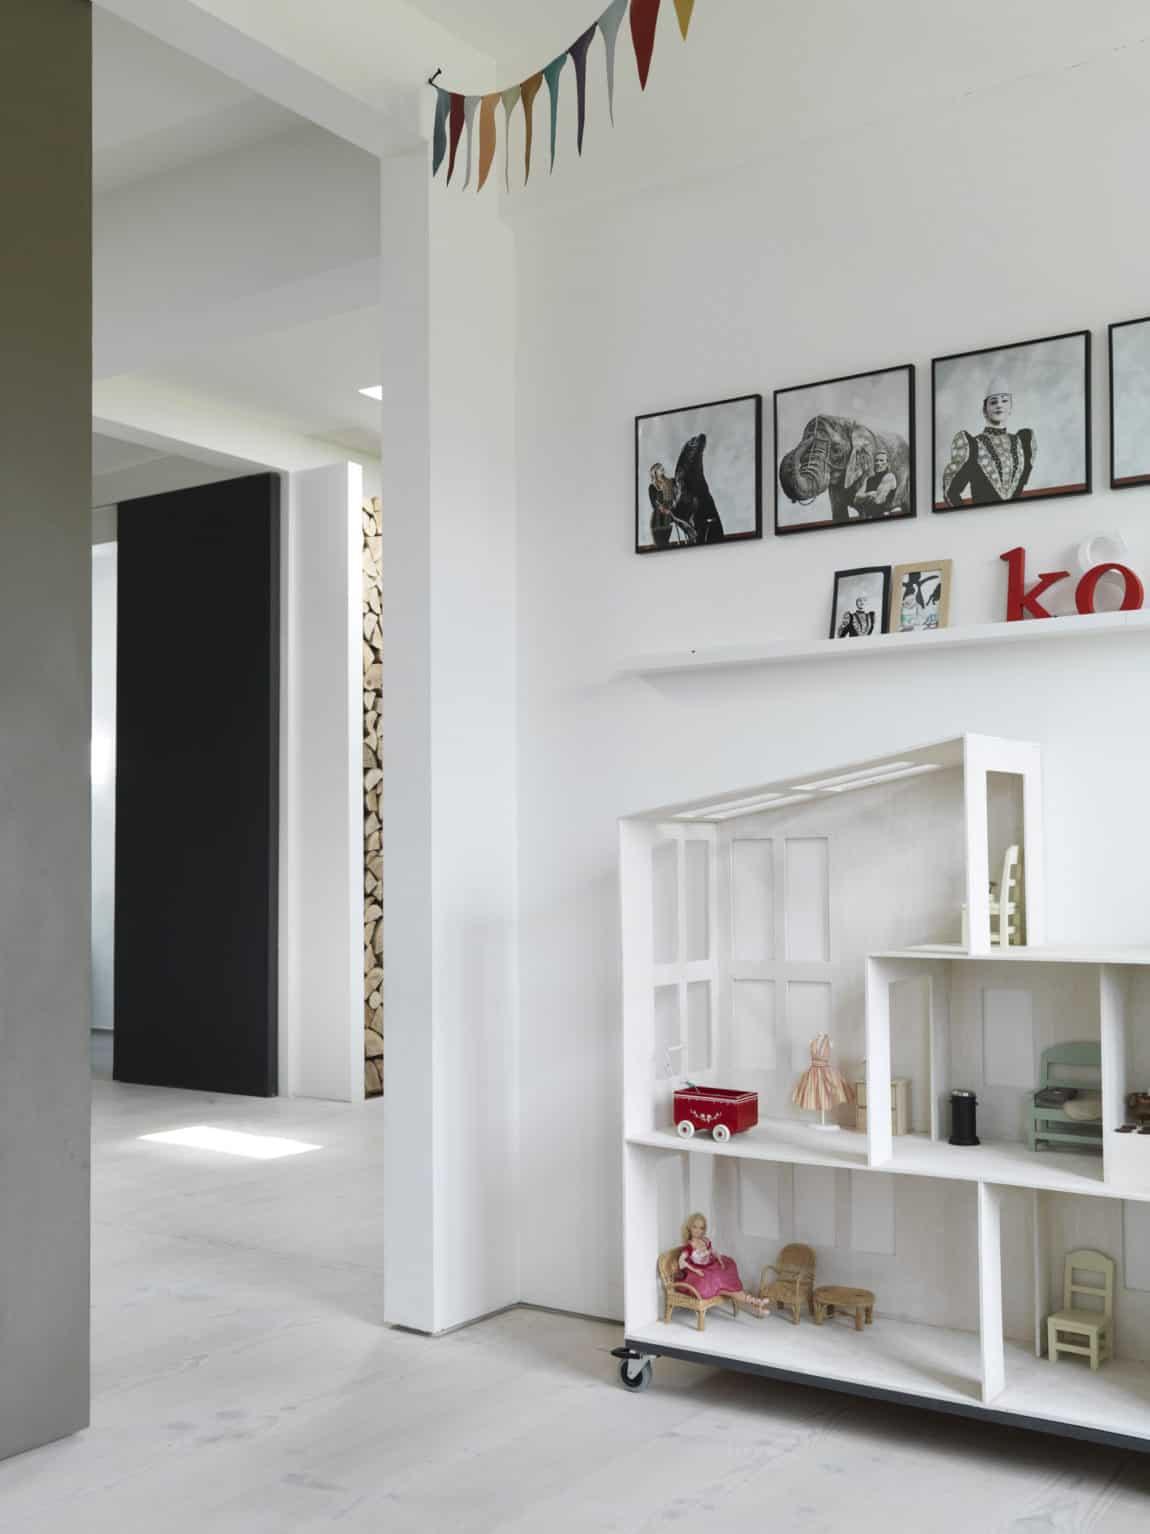 The Home of Morten Bo Jensen by Vipp (21)